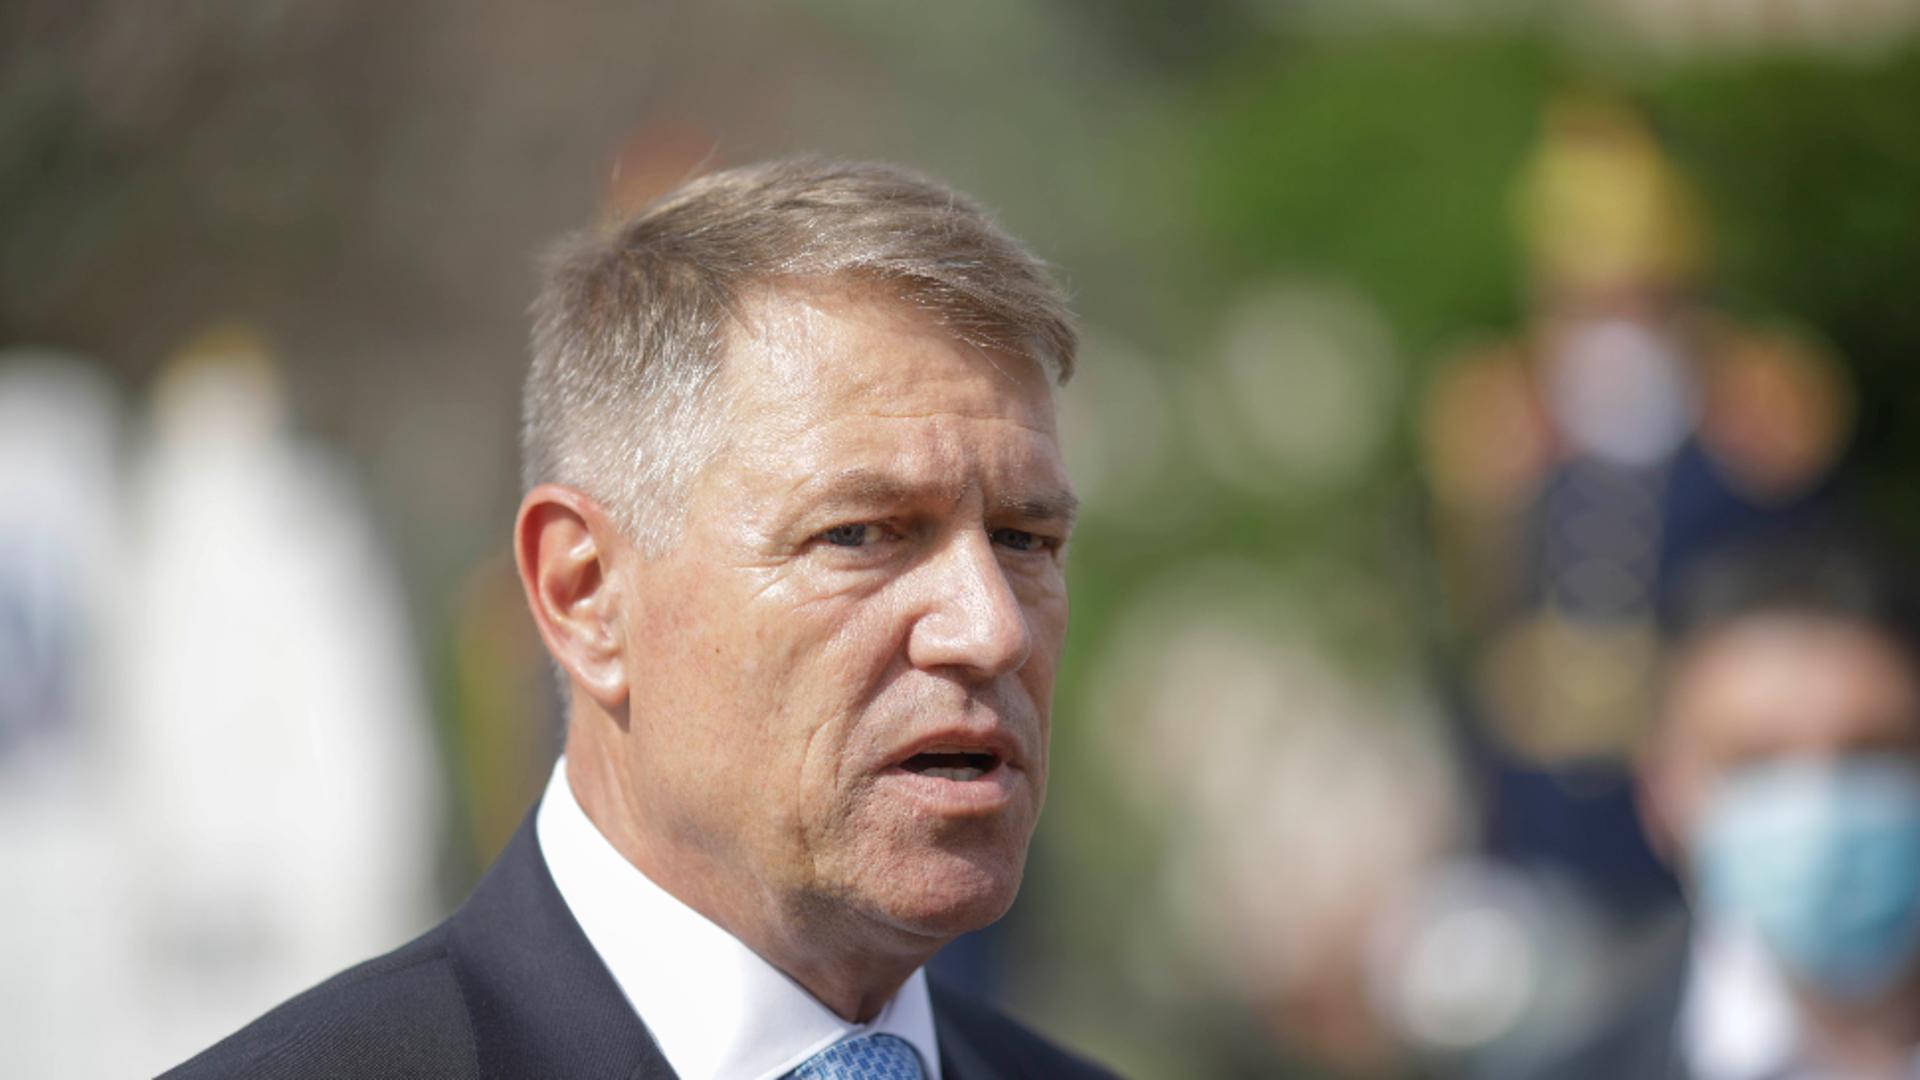 Președintele Klaus Iohannis